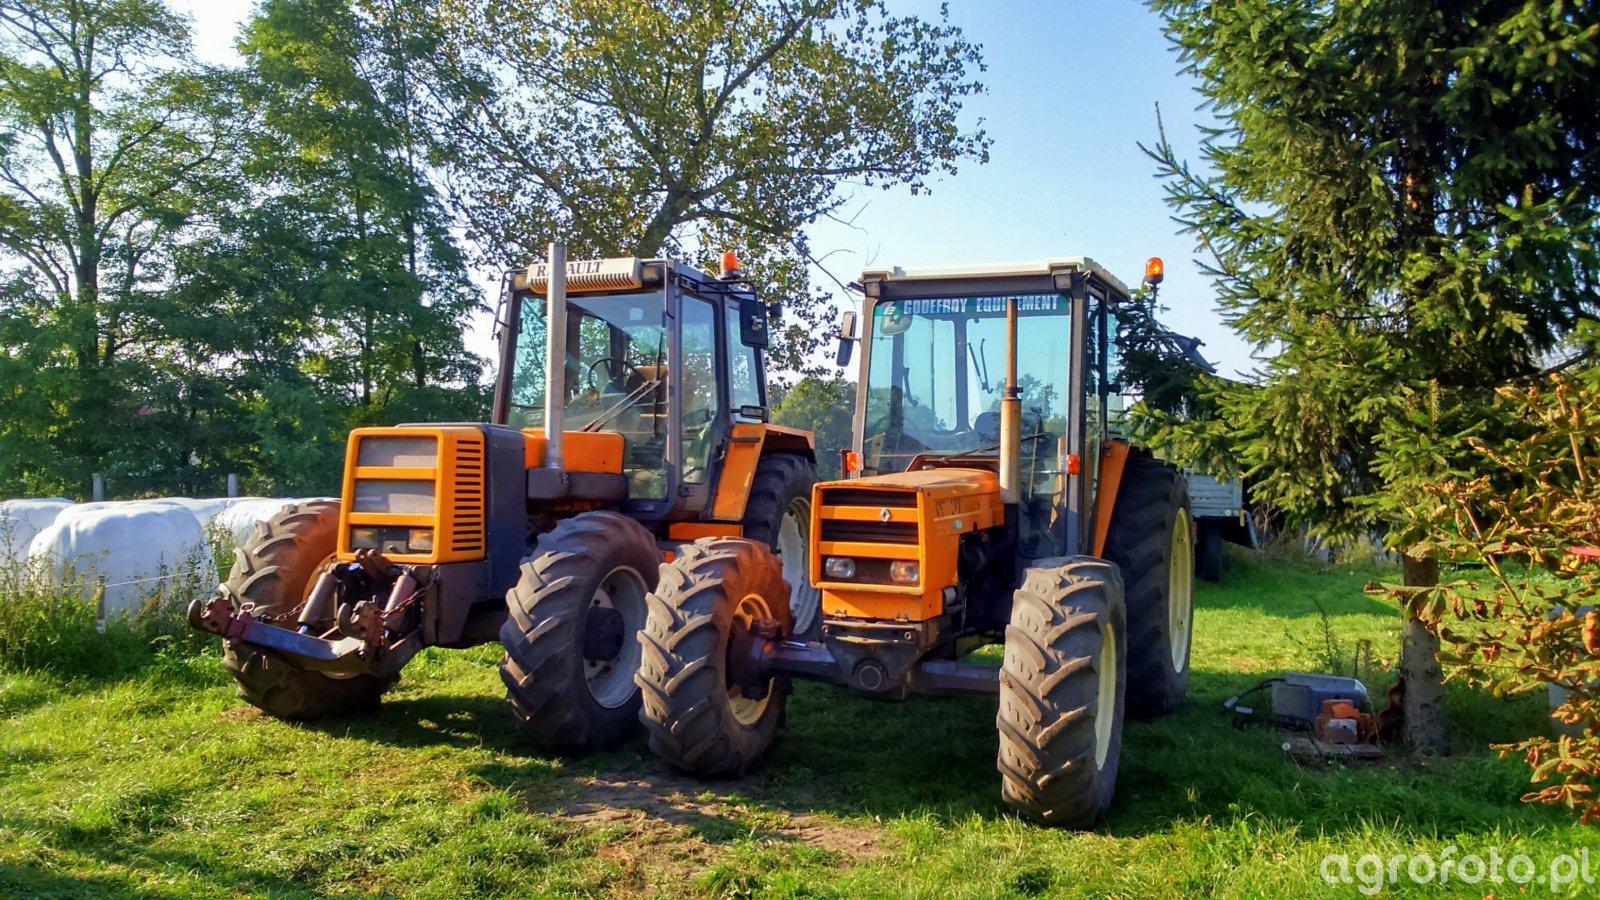 Renault 113.14 & Renault 851.4s